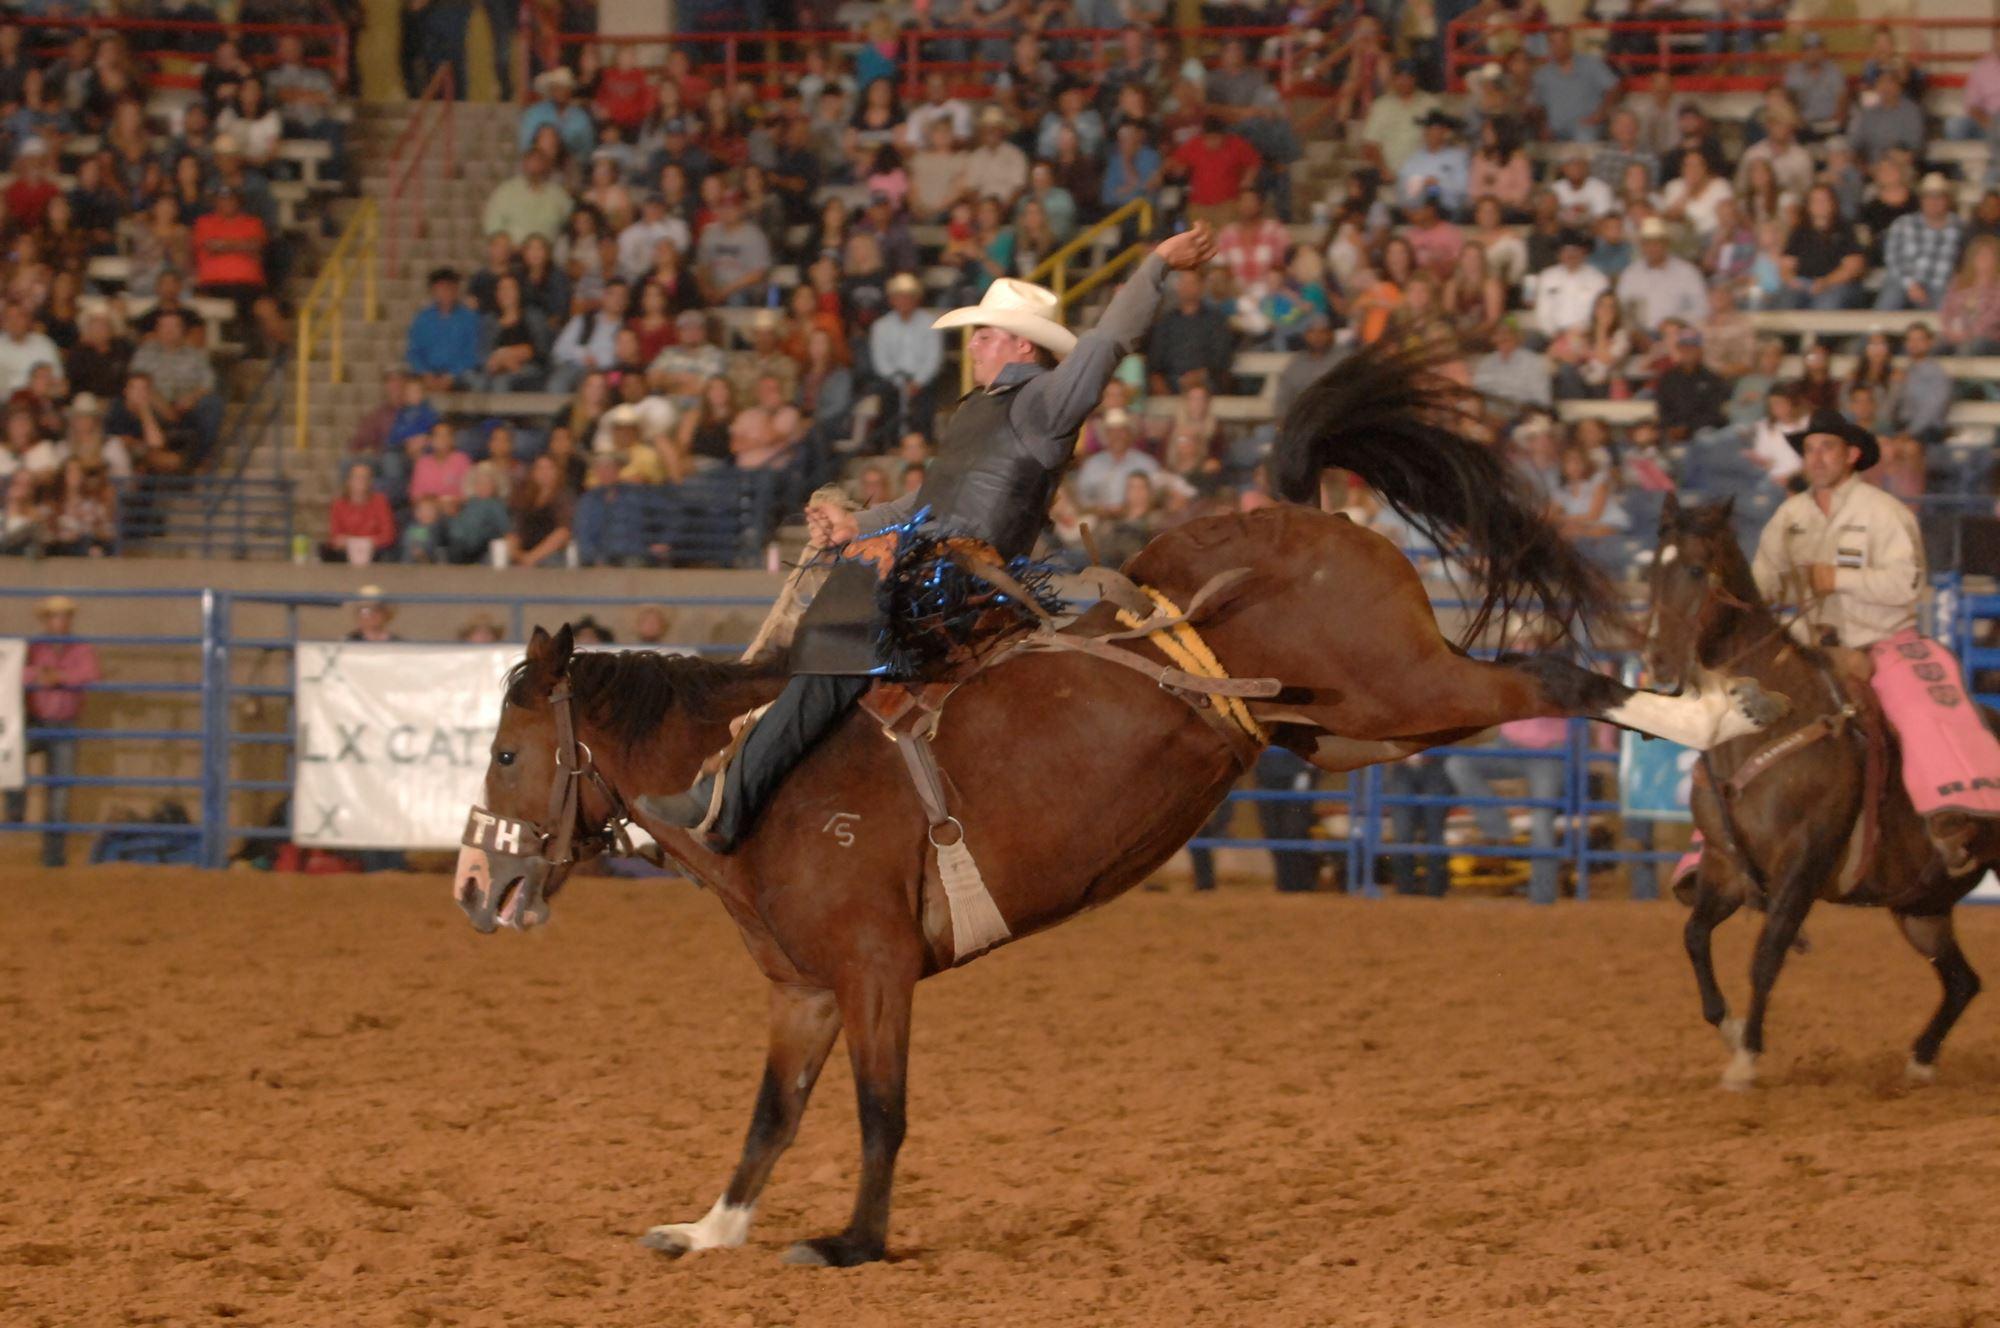 horse, cowboys, dirt, arena, crowd bucking horse